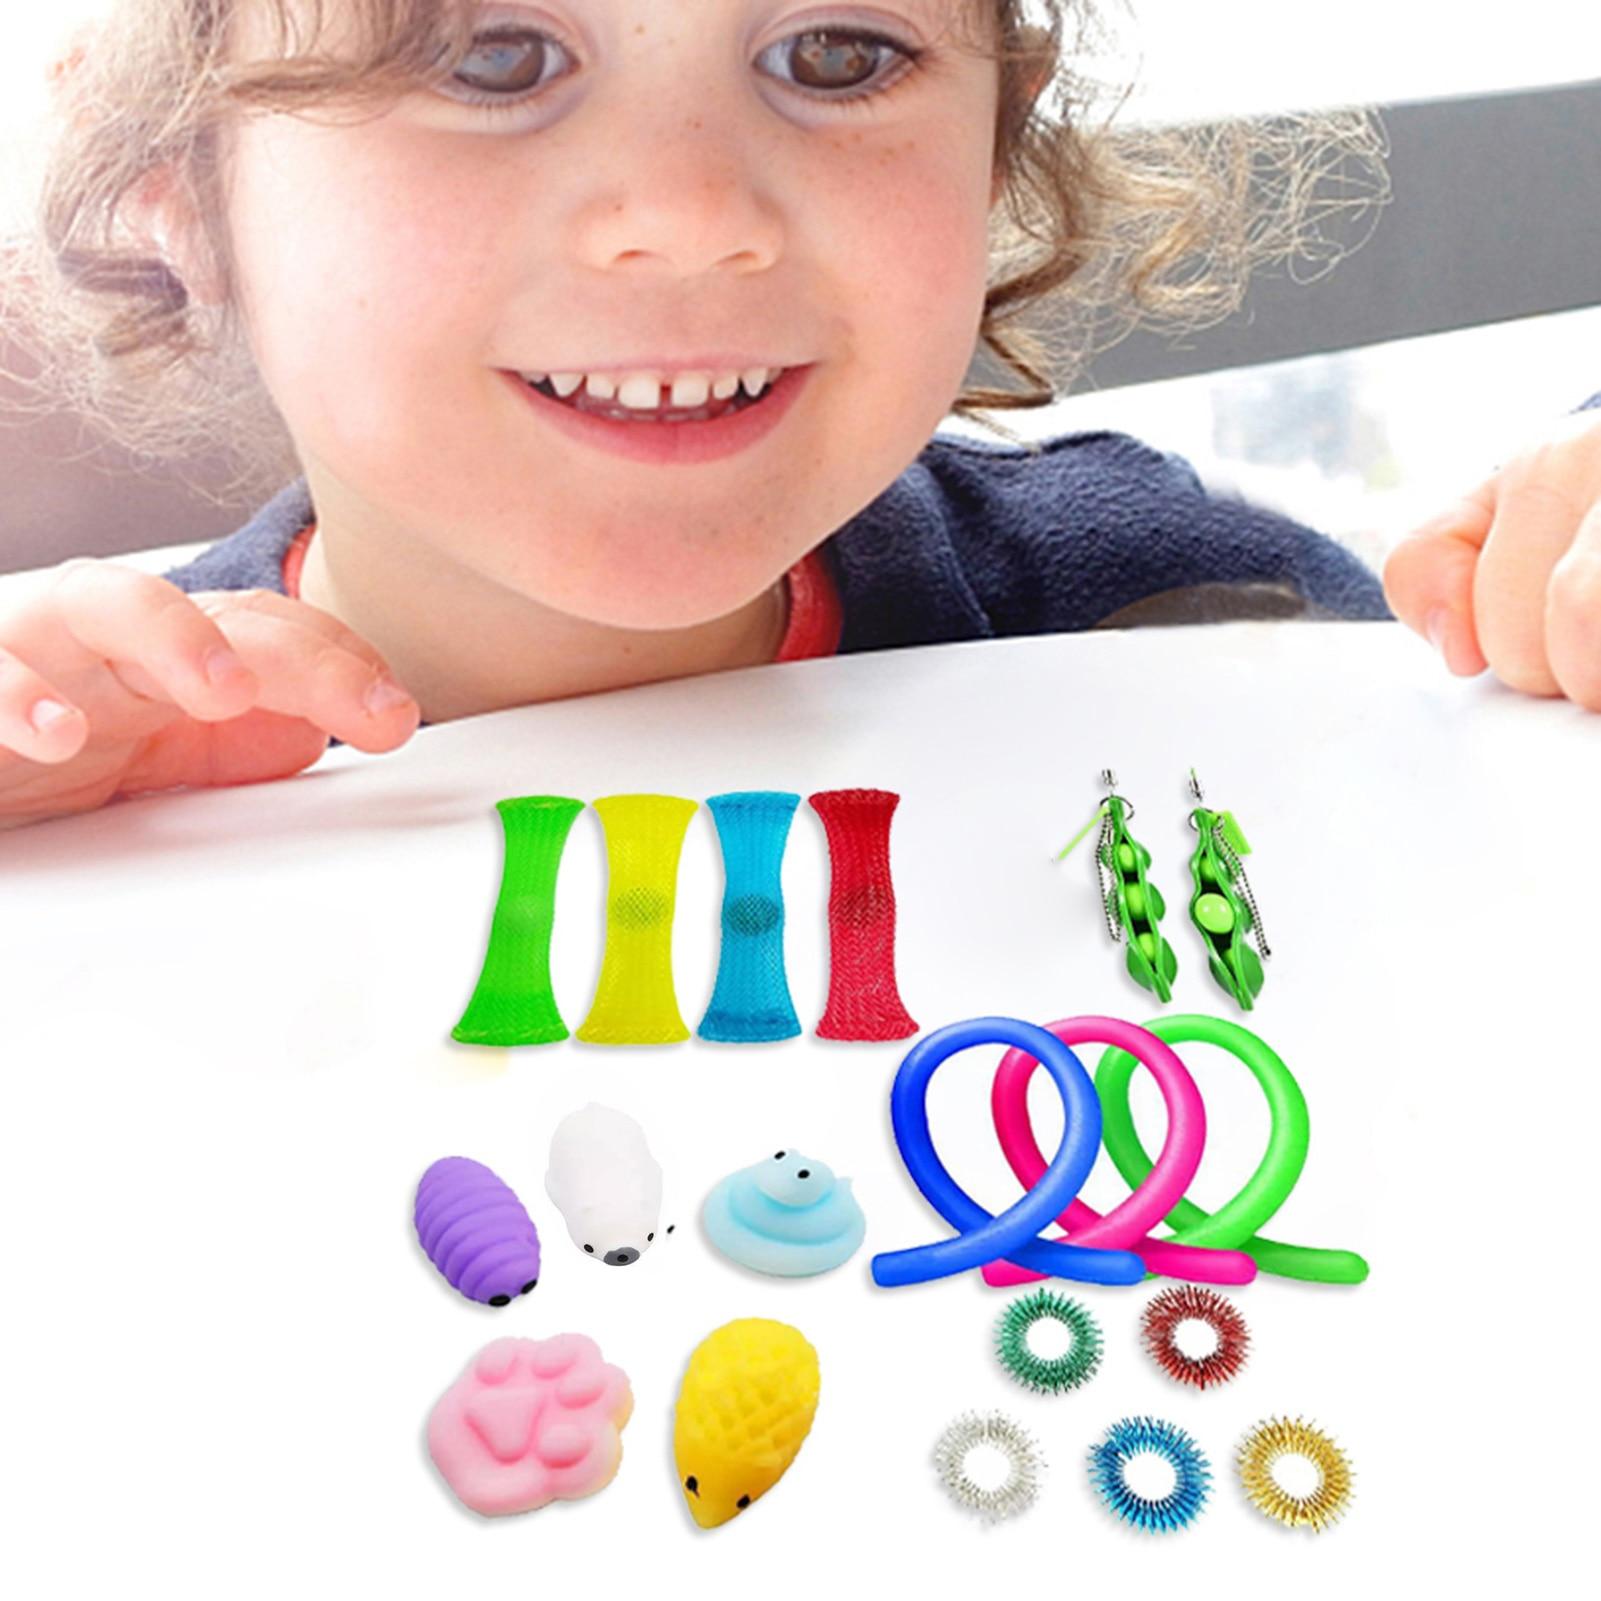 20pcs Anti Stress Toy Set Sensory Toy Set Relief Stress Sensory Anxiety Stress Relief Toy Set Fidget Toys For Kids Adult enlarge